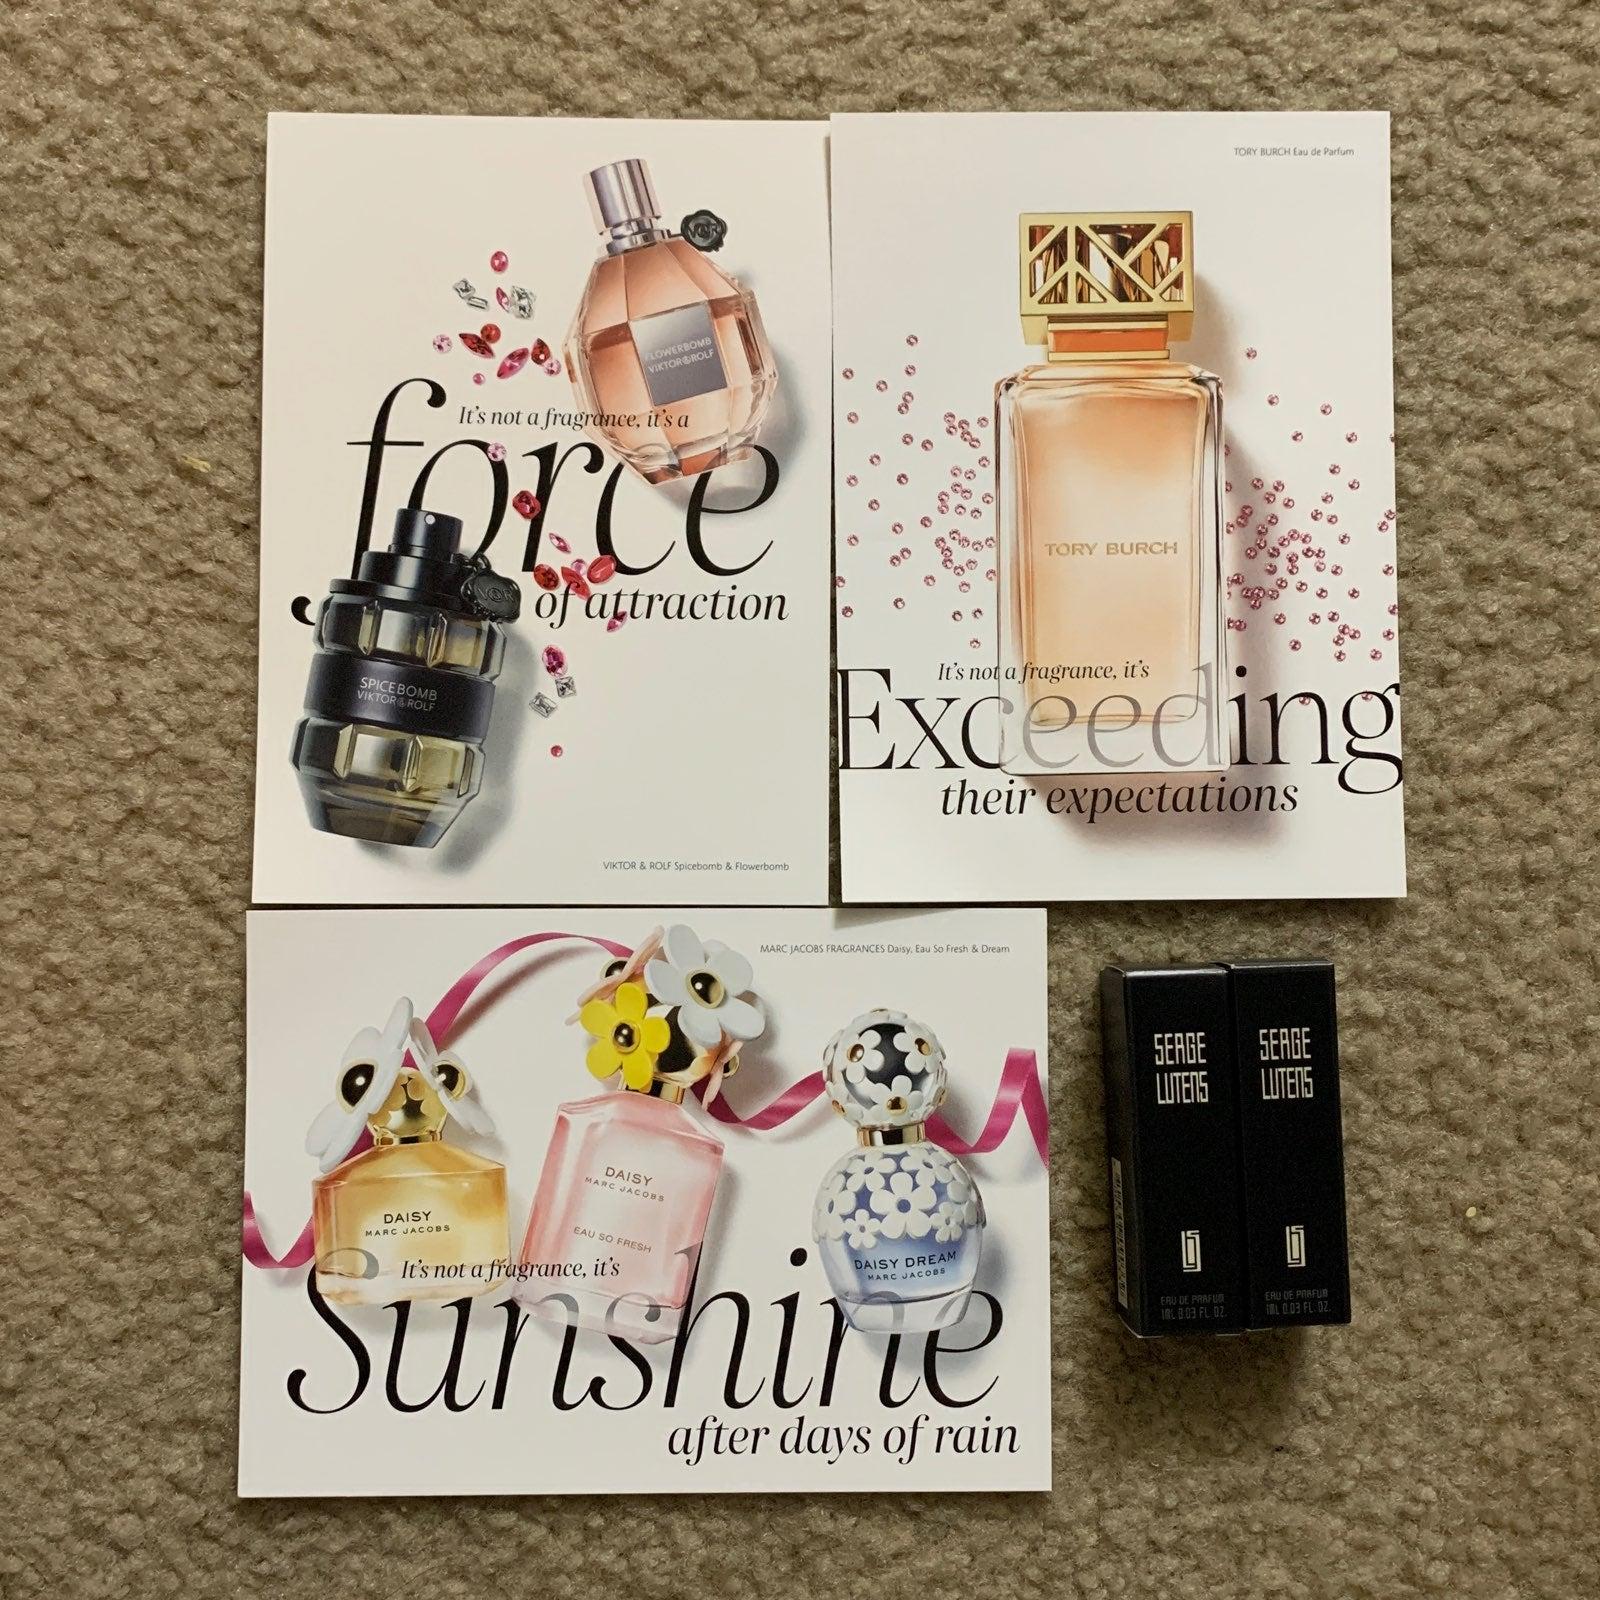 high end perfume samples set